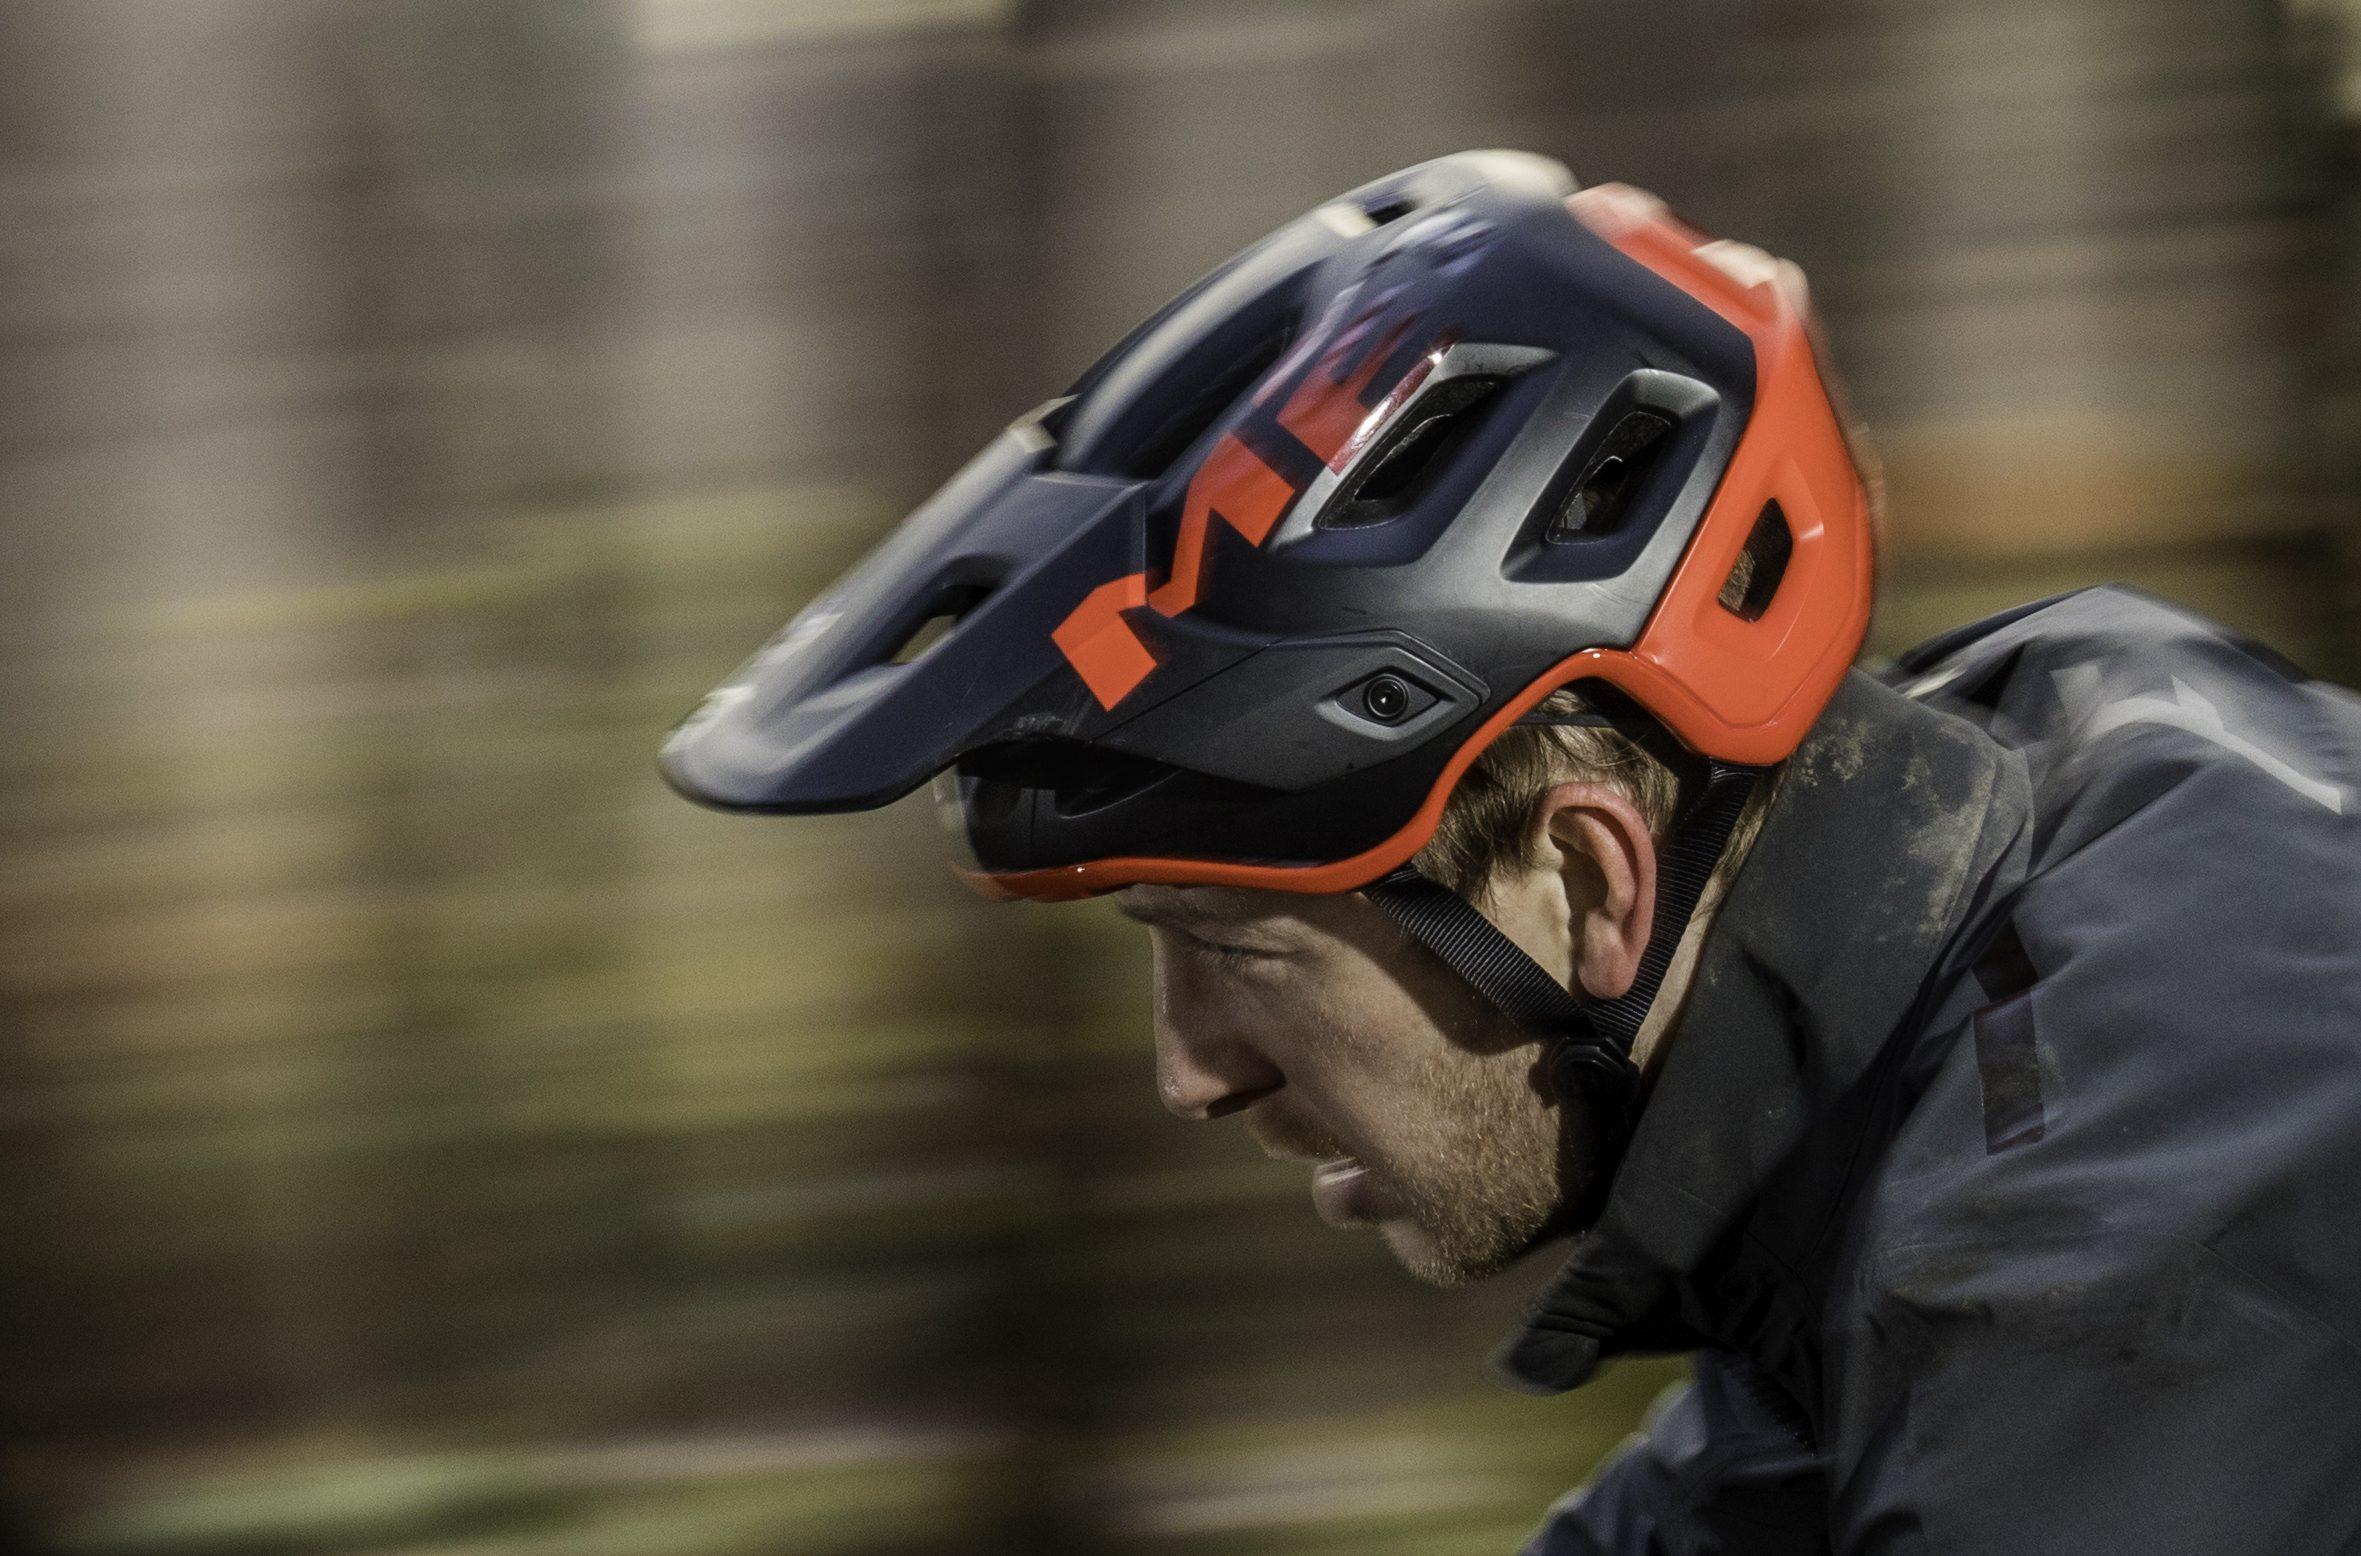 17 Best Mountain Bike Helmets Reviewed Mbr